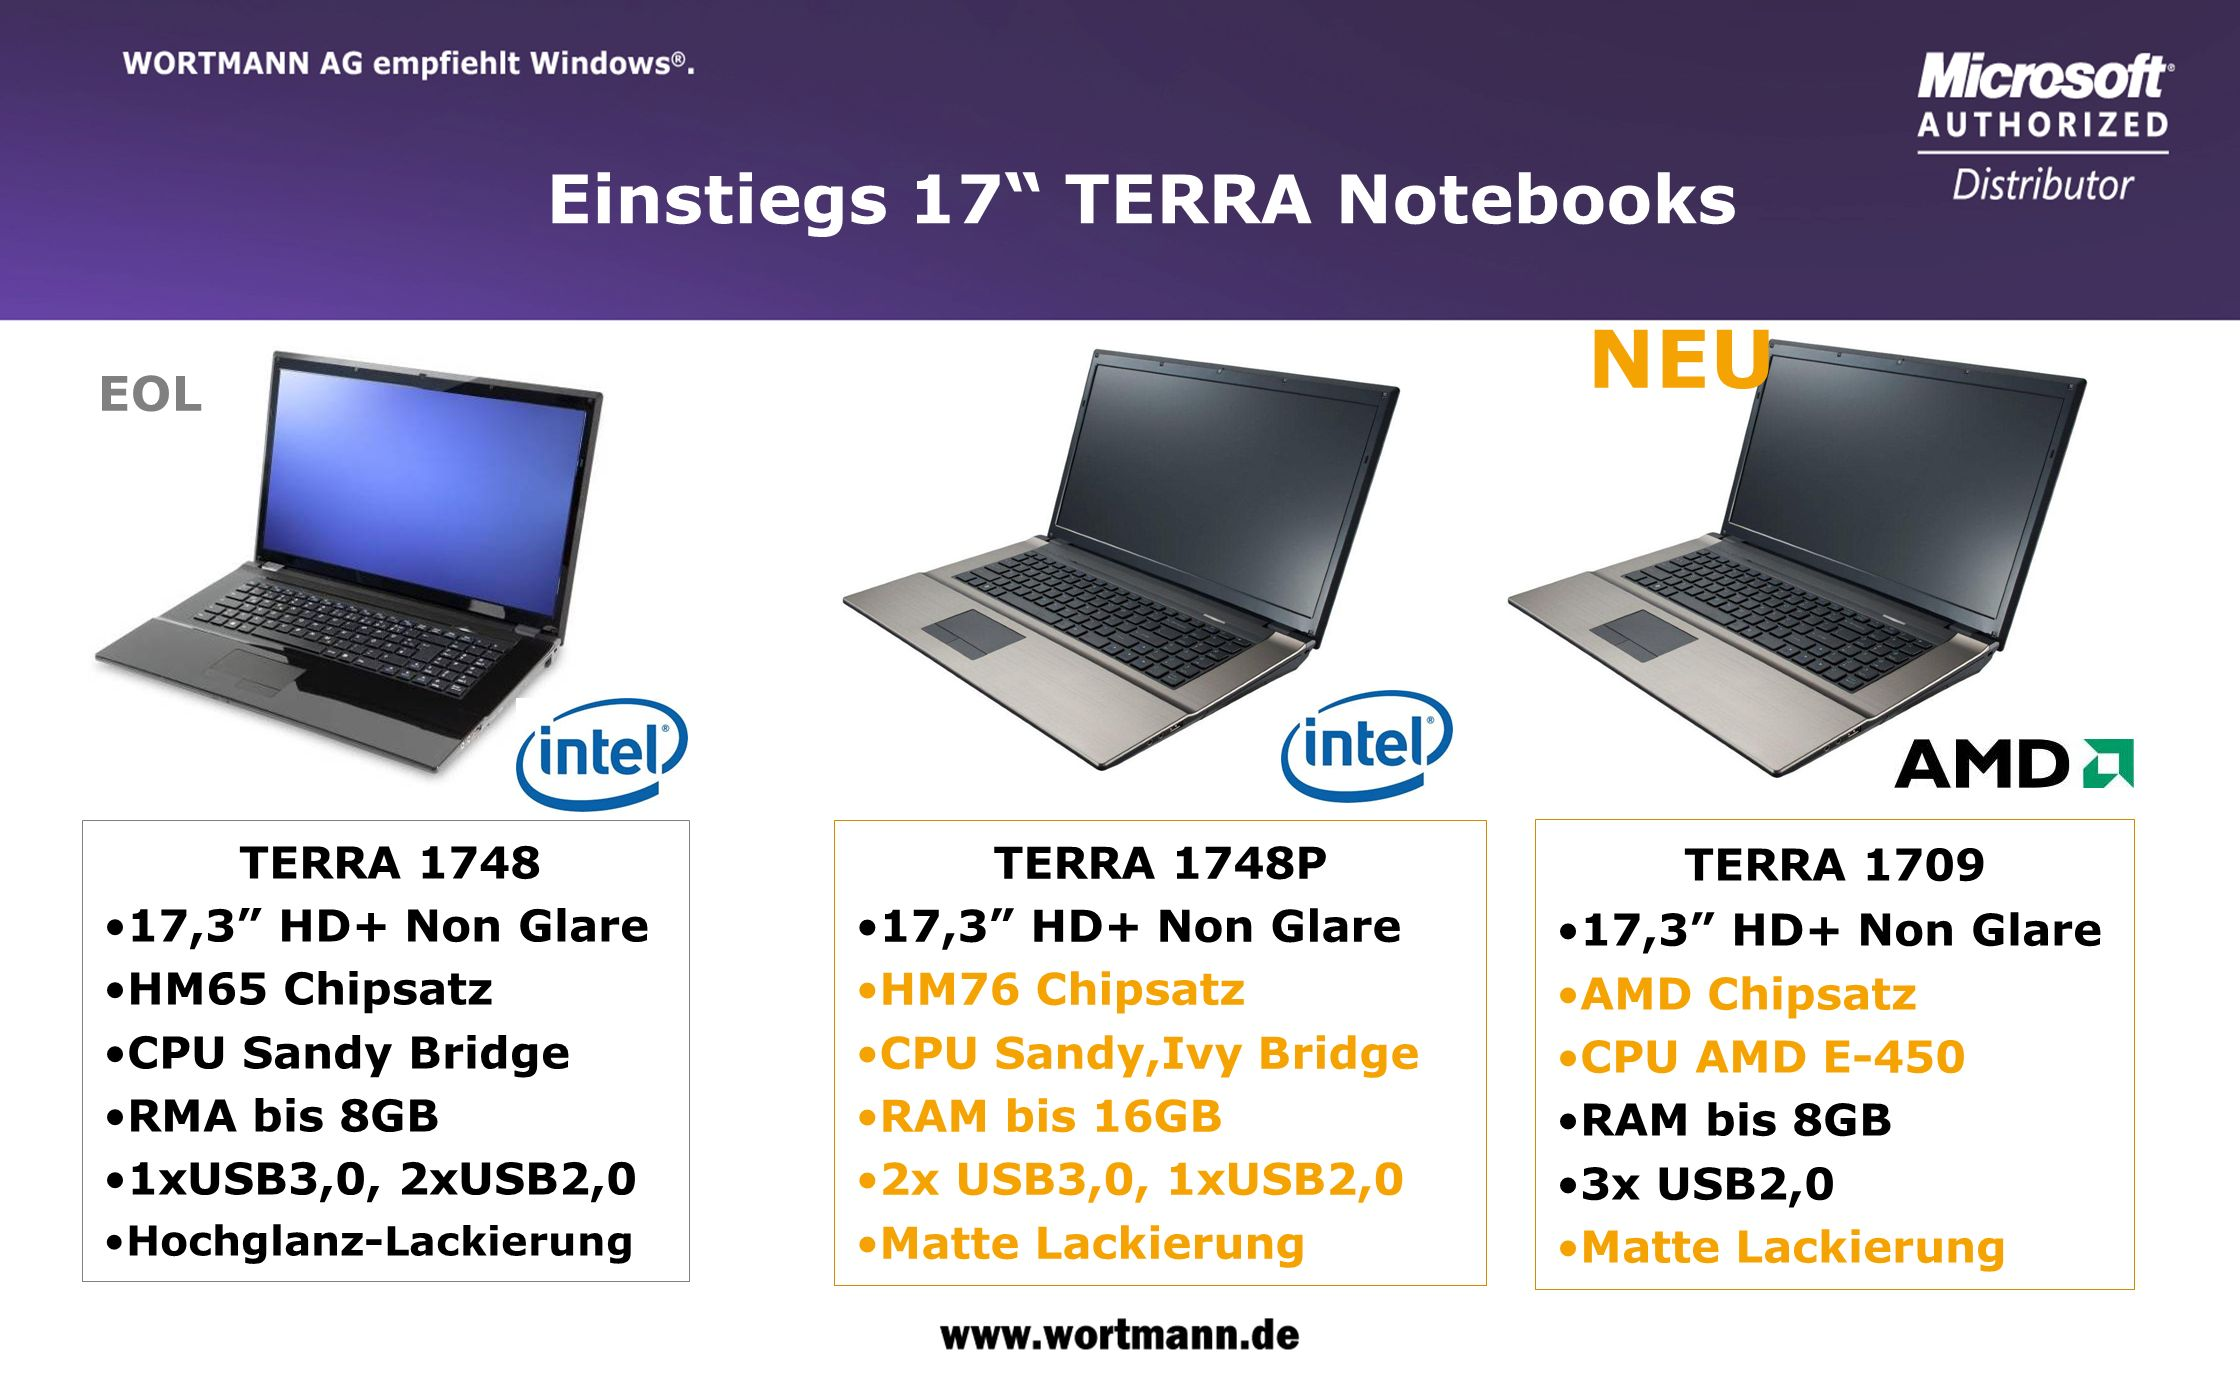 www.wortmann.de Einstiegs 17 TERRA Notebooks TERRA 1748 17,3 HD+ Non Glare HM65 Chipsatz CPU Sandy Bridge RMA bis 8GB 1xUSB3,0, 2xUSB2,0 Hochglanz- La